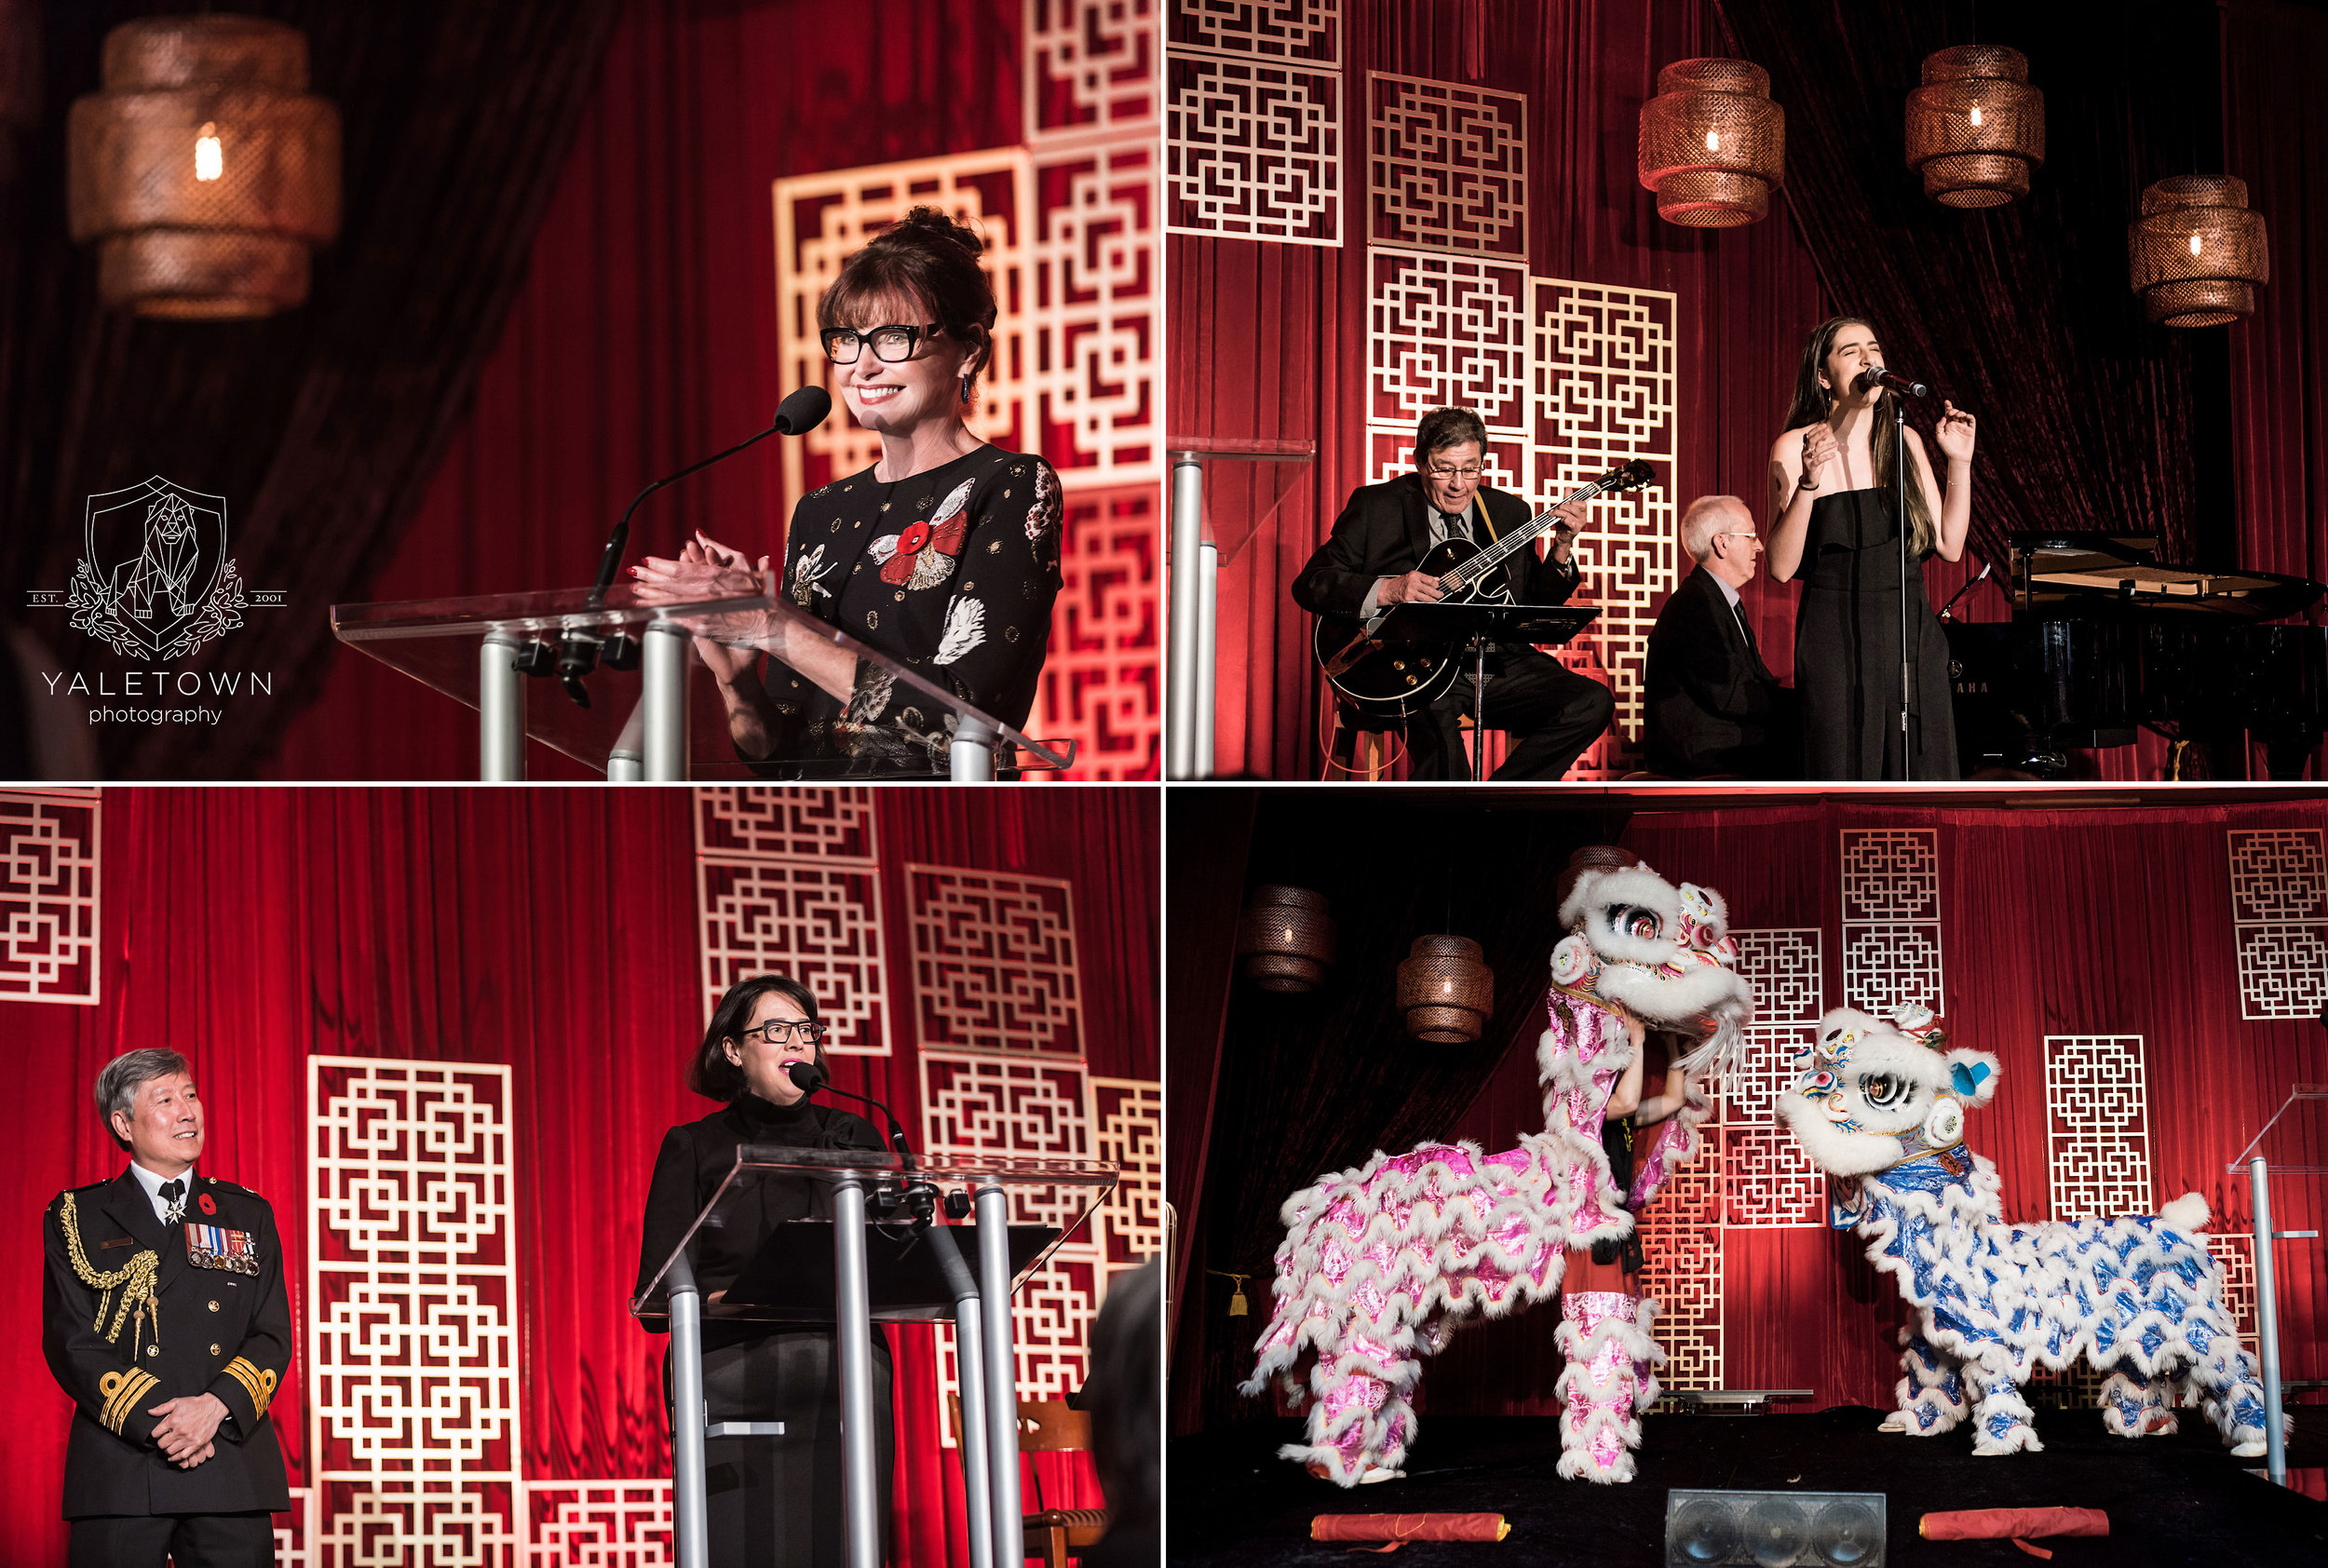 Vancouver-Chinatown-Foundation-Gala-Janet-Austin-Carol-Taylor-Fairmont-Hotel-Vancouver-Yaletown-Photography-Event-Photographer-photo